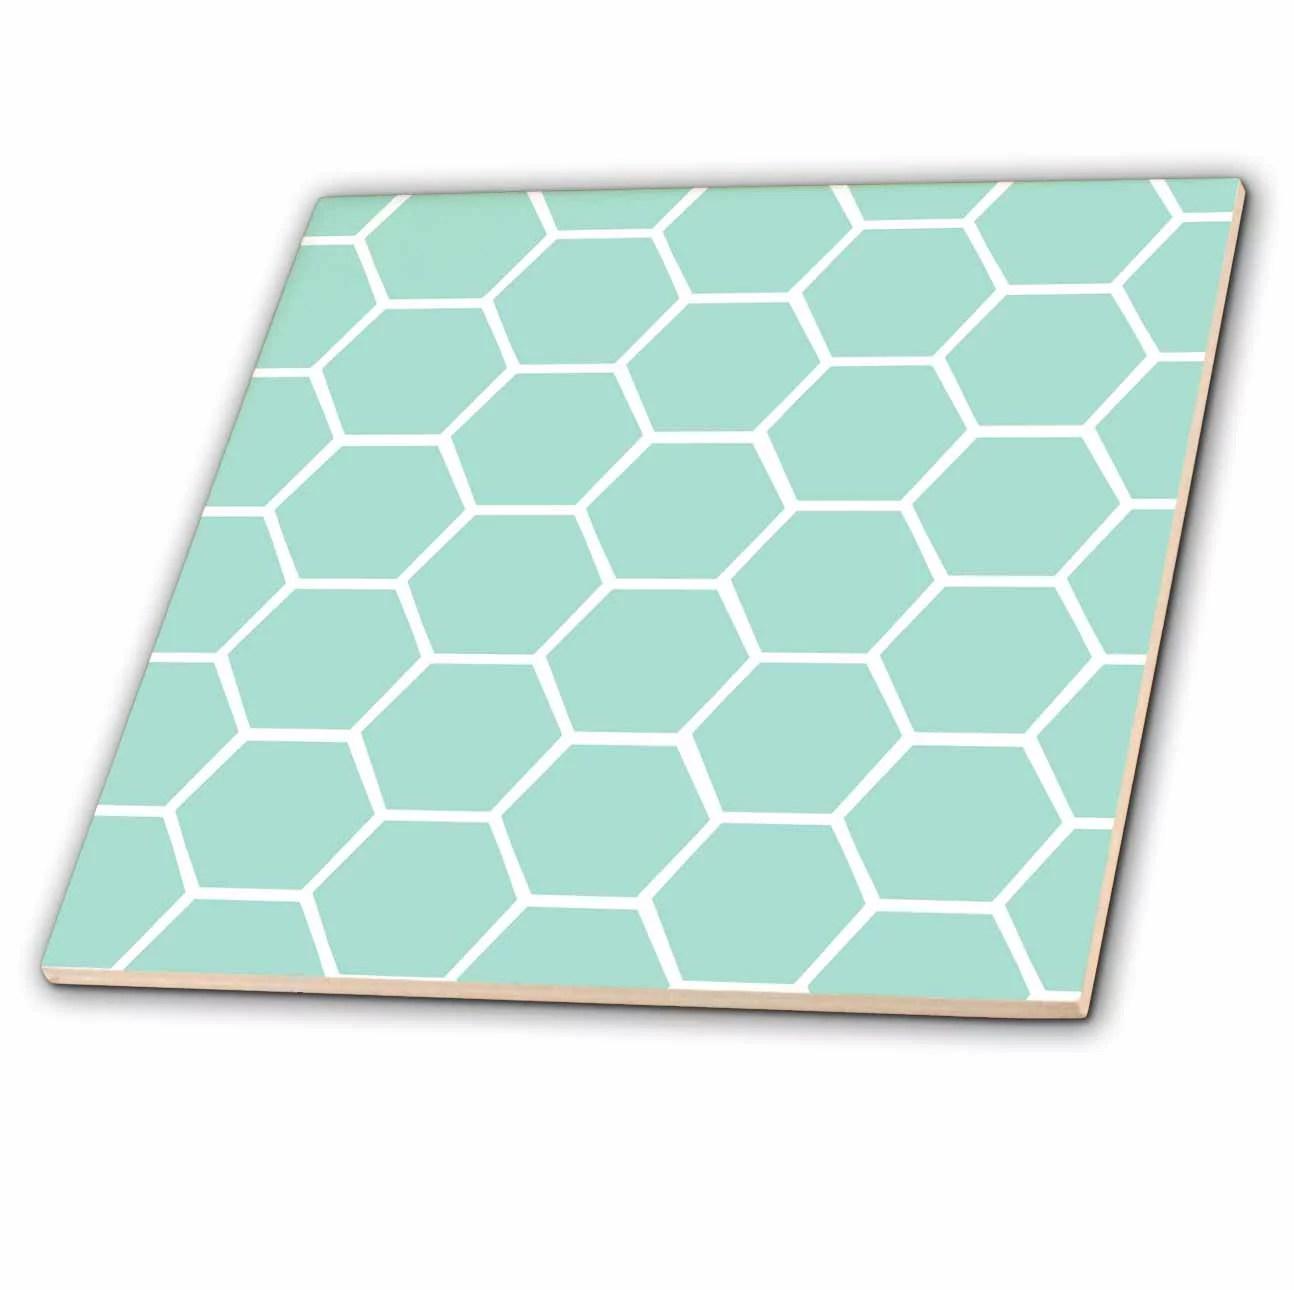 https www walmart com ip 3drose mint honeycomb pattern pastel aqua blue hexagons light teal turquoise bee hive hexagonal design ceramic tile 4 inch 983614899